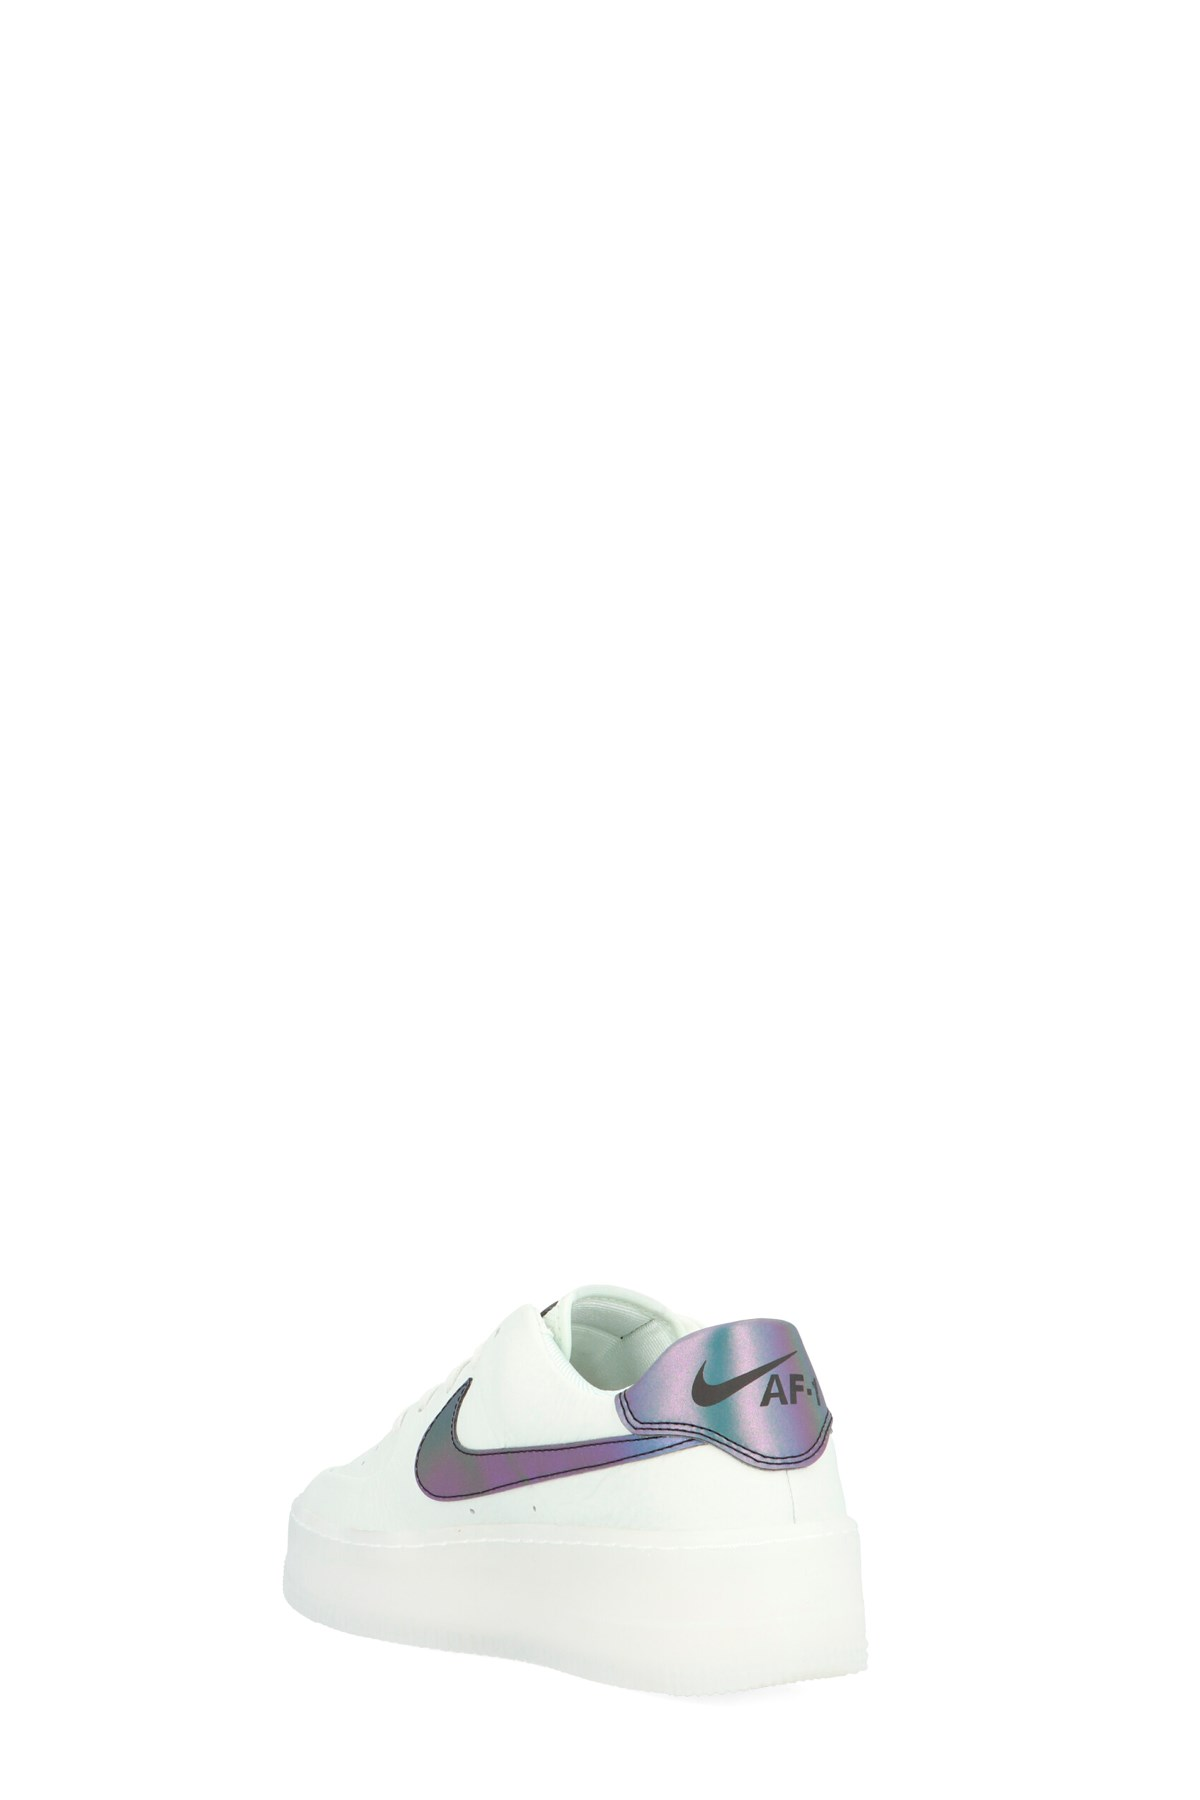 'Air force 1 sage low lx' sneakers